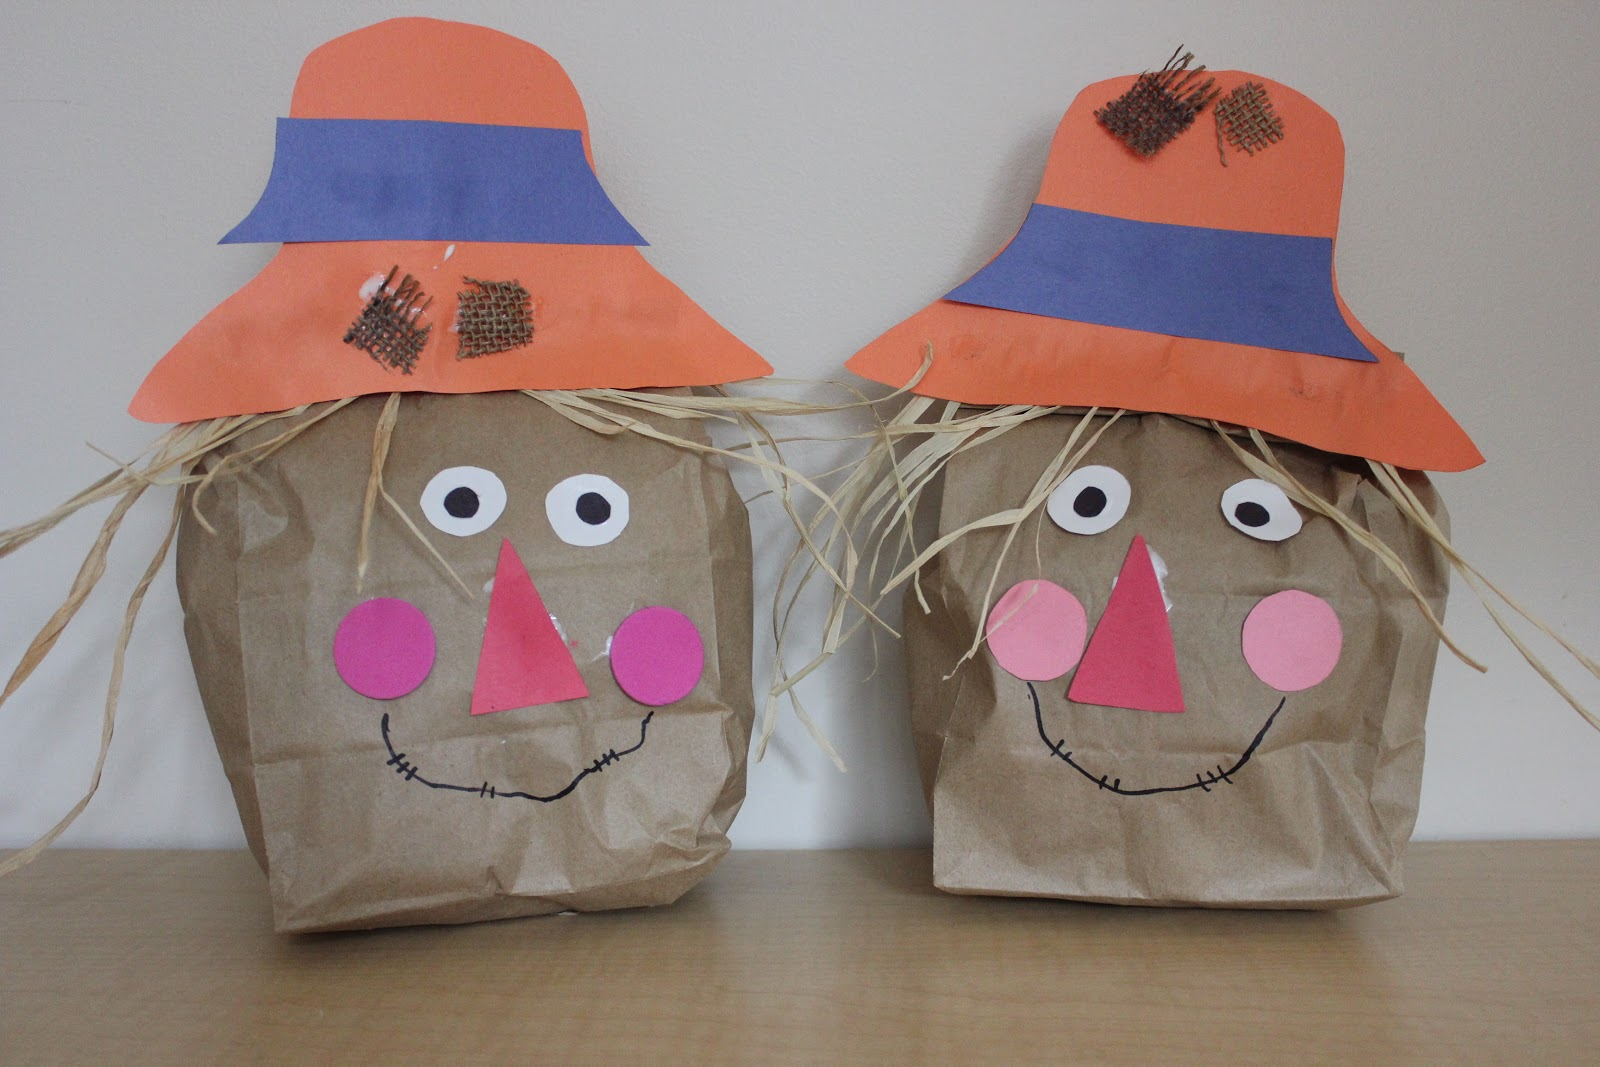 scarecrow crafts for preschoolers paper bag crafts for paper crafts ideas for 844